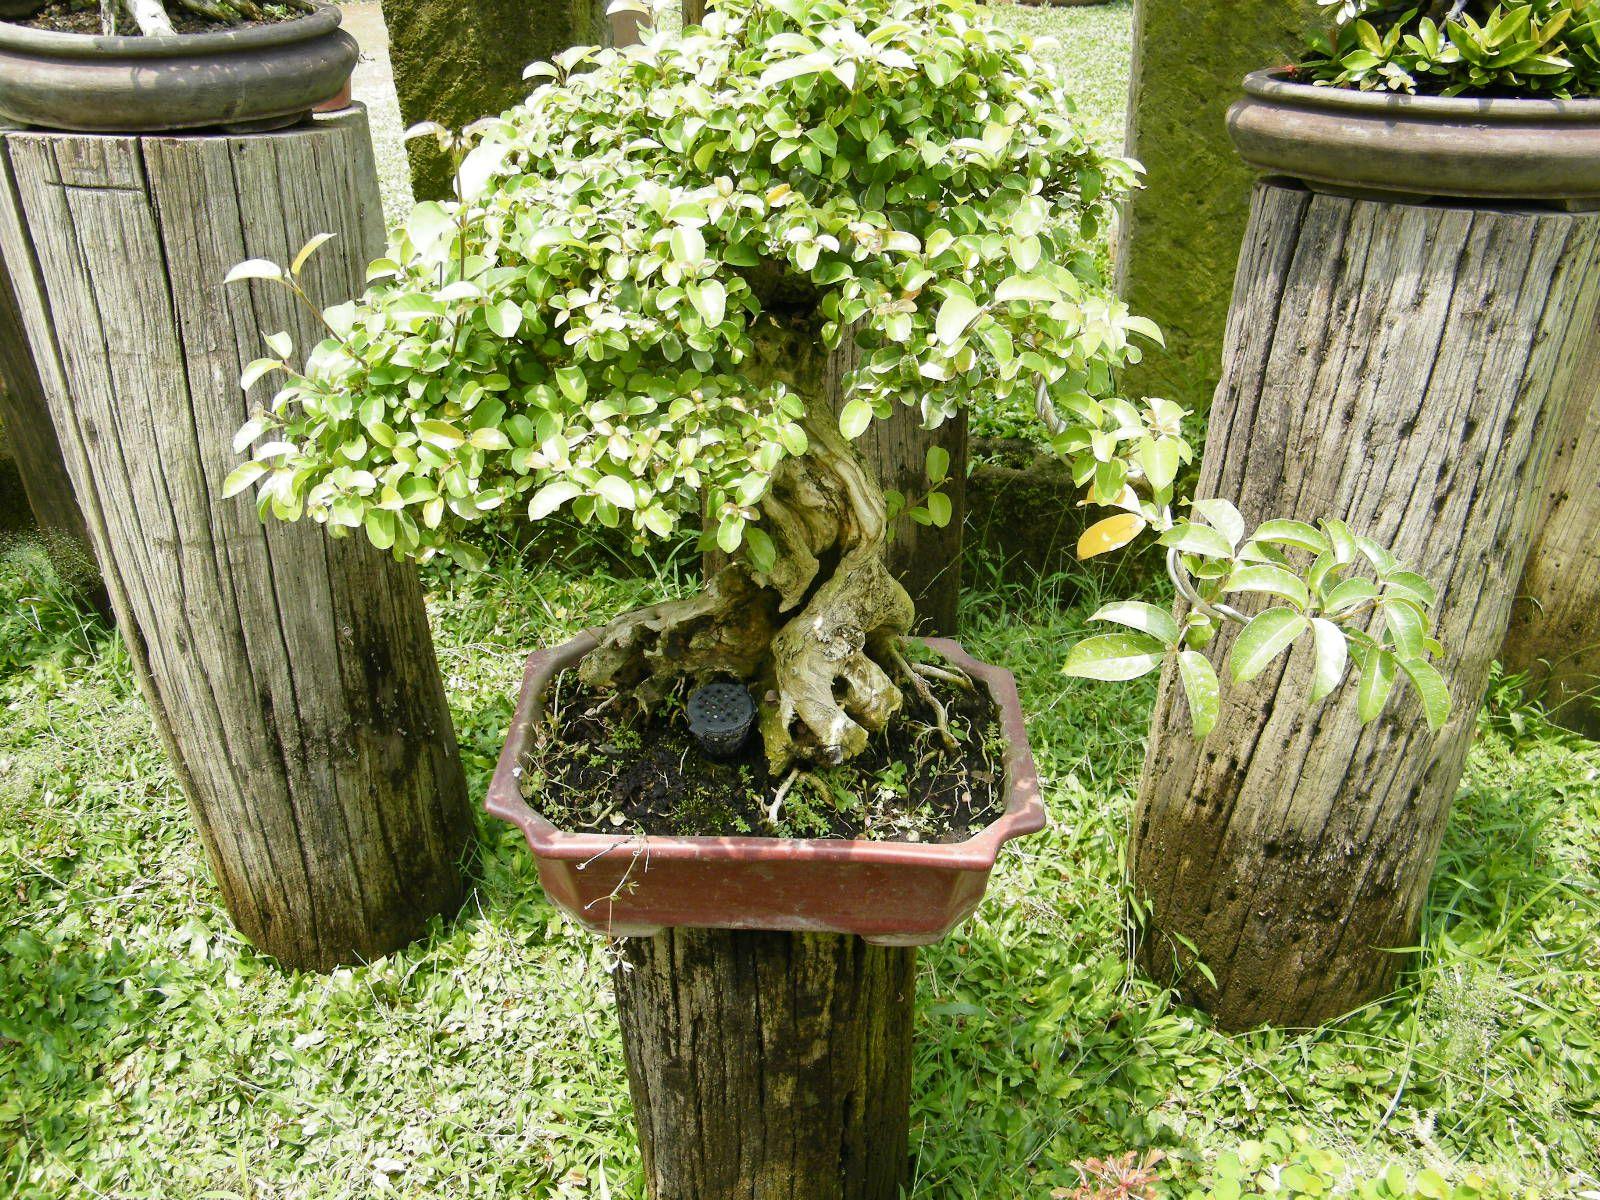 Rogie S Bonsai Garden San Fernando Pampanga Philippines  # Muebles Pampanga